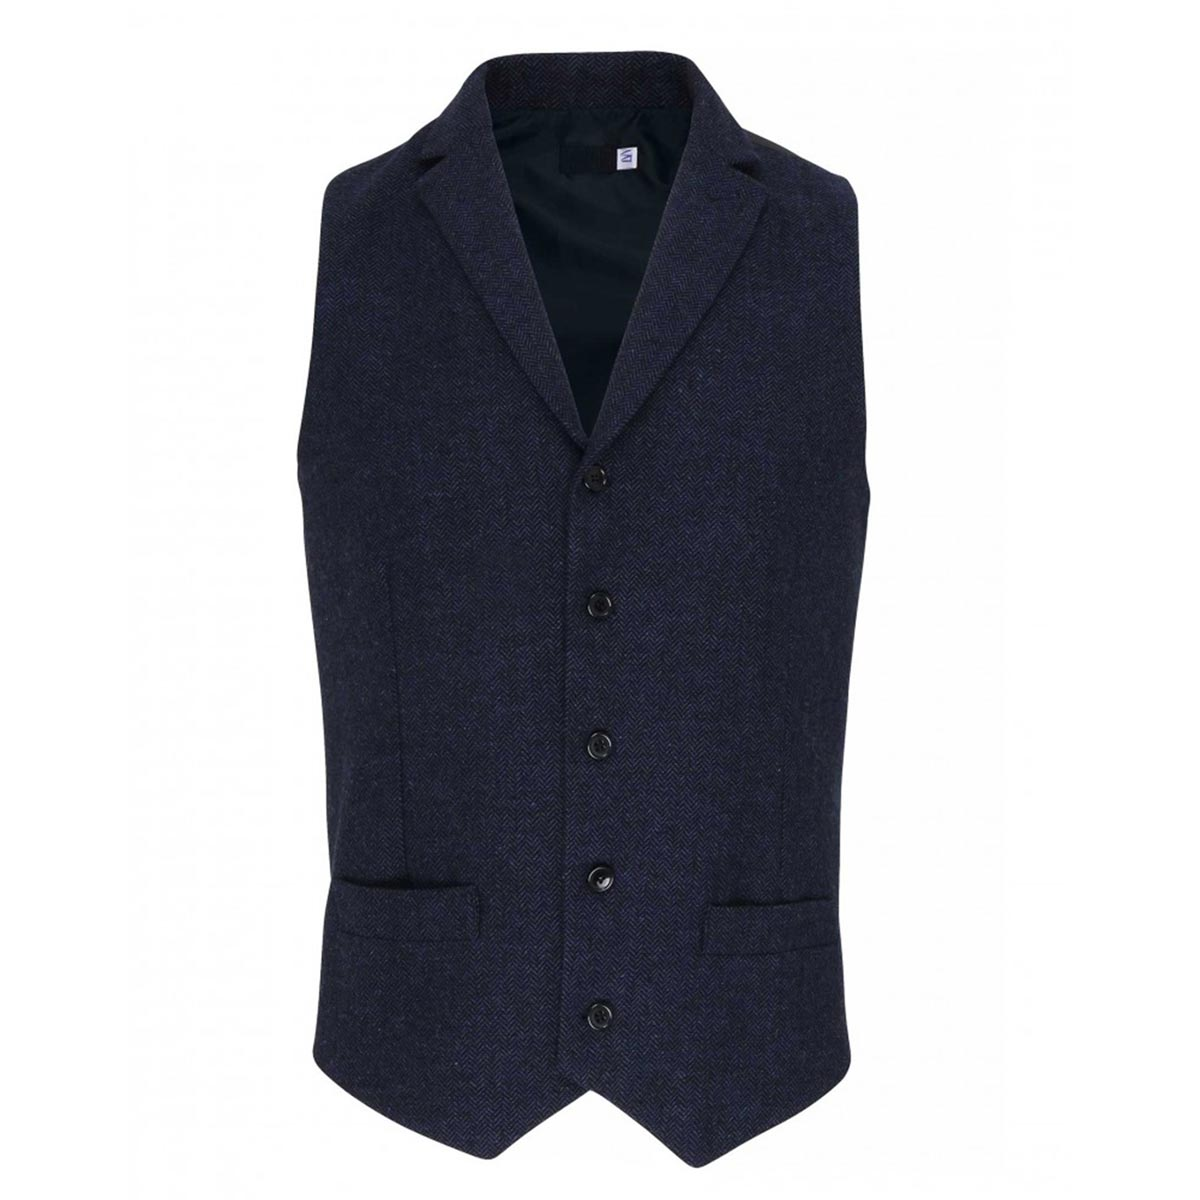 Mens Herringbone Waistcoat - pr625_navy